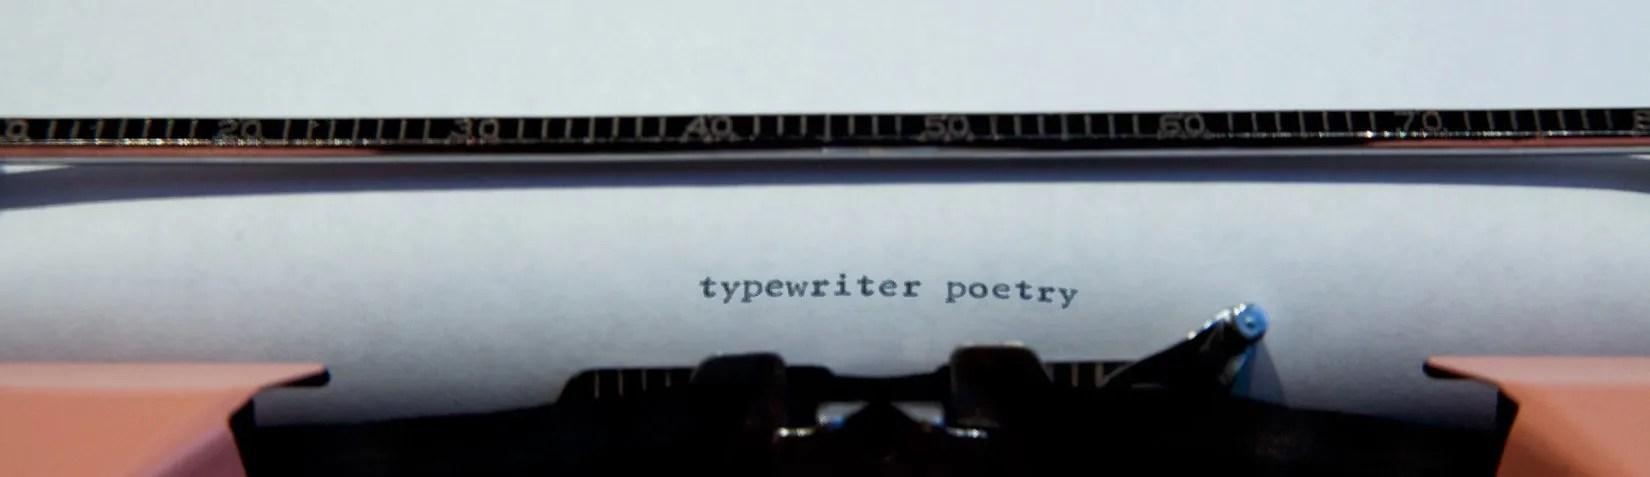 typewriter-poetry-header-new